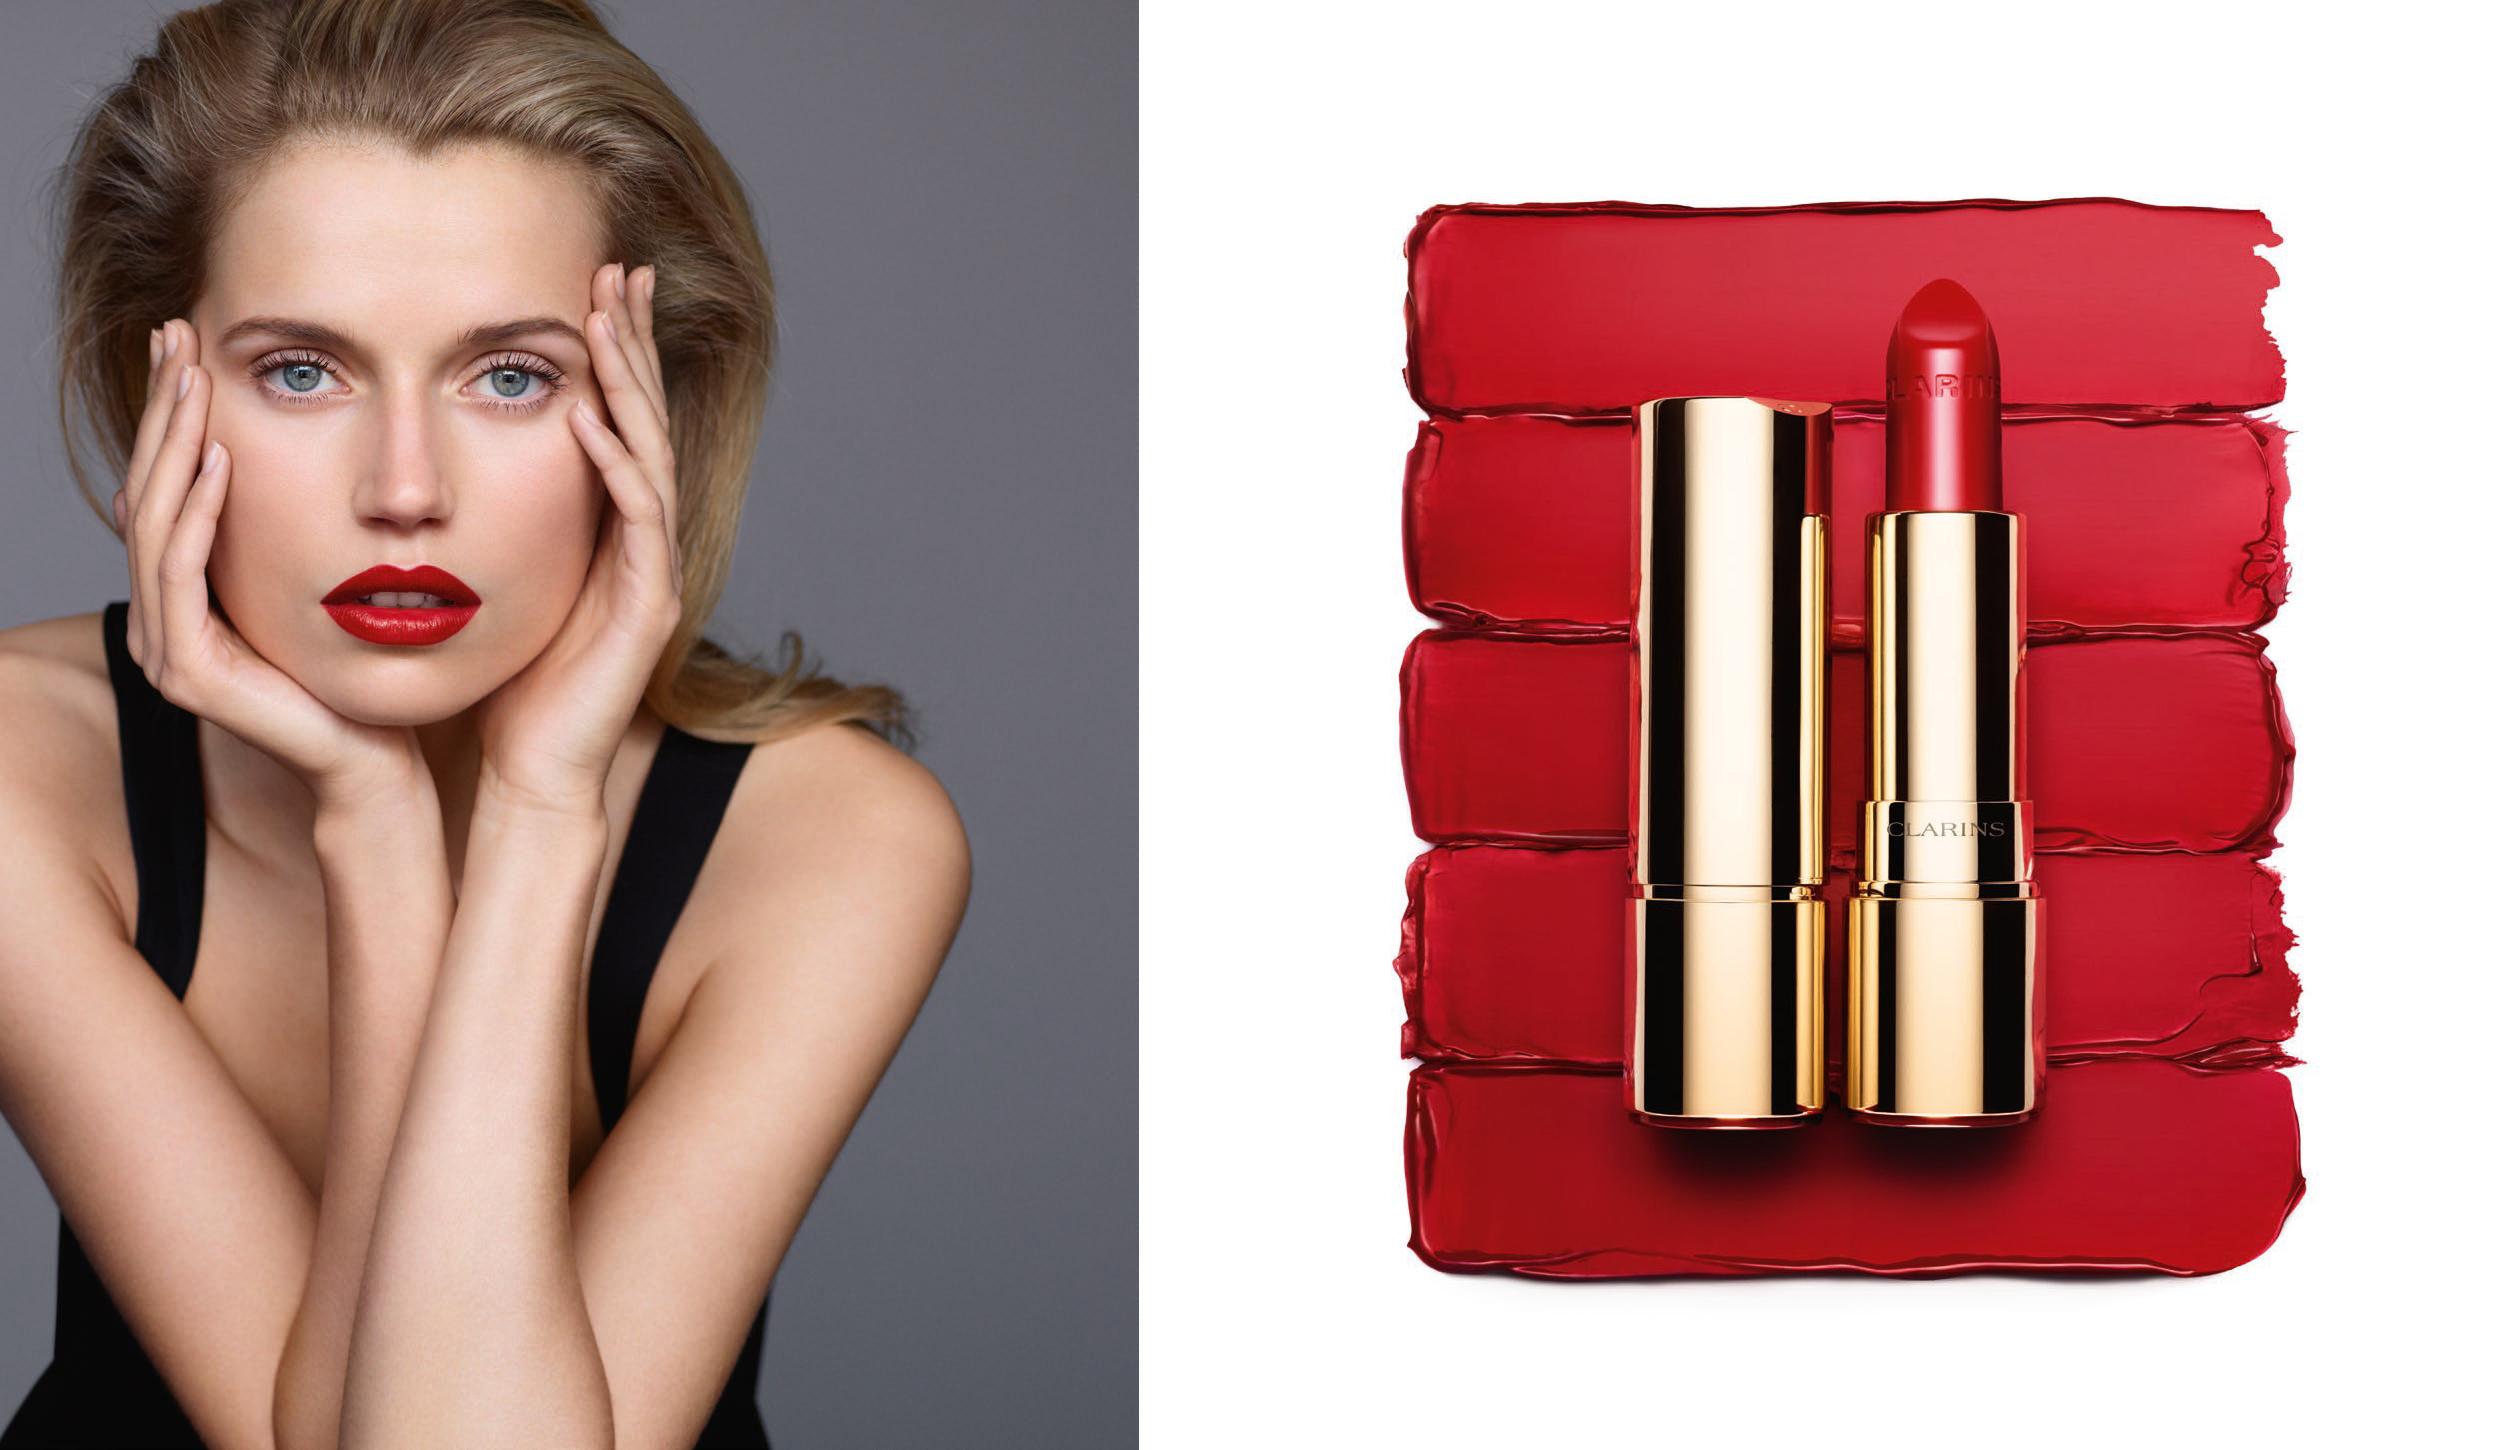 Joli Rouge modelo Clarins